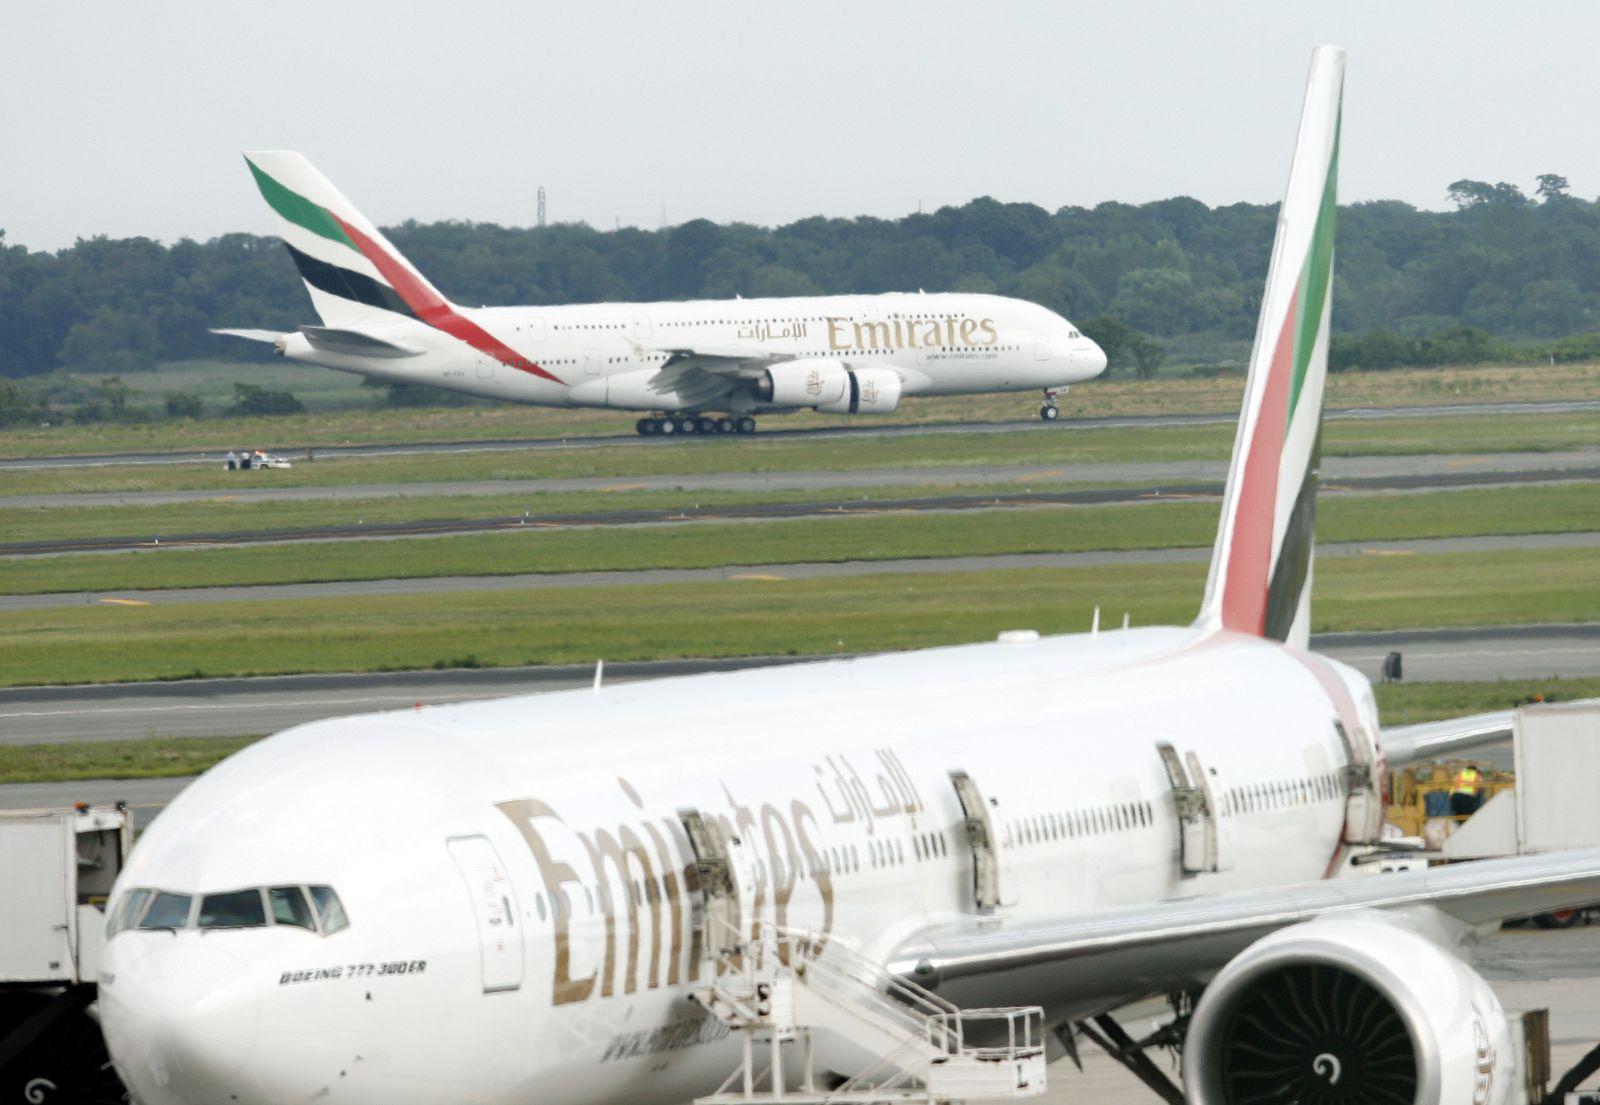 Emirates Airline / Flugzeuge